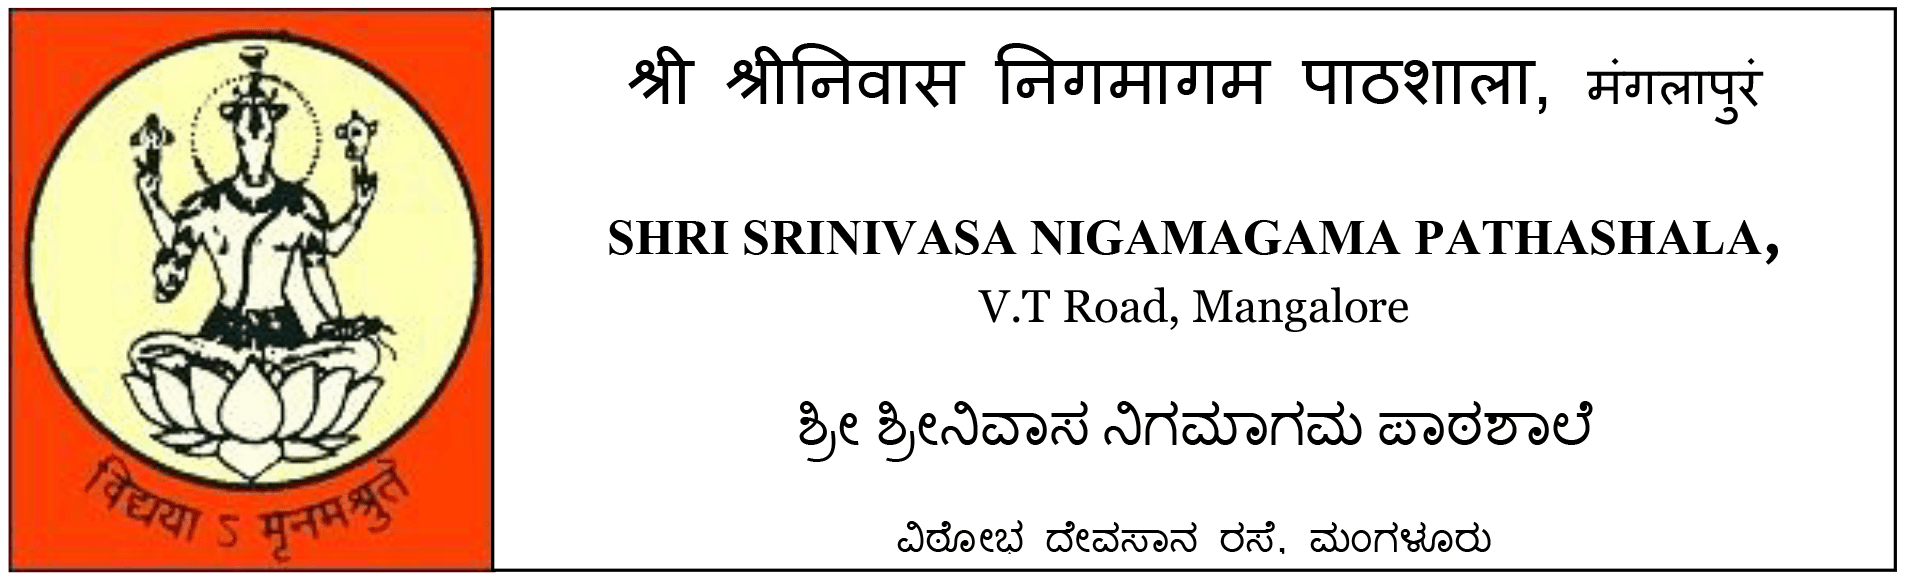 Shri Srinivasa Nigamagama Pathashala